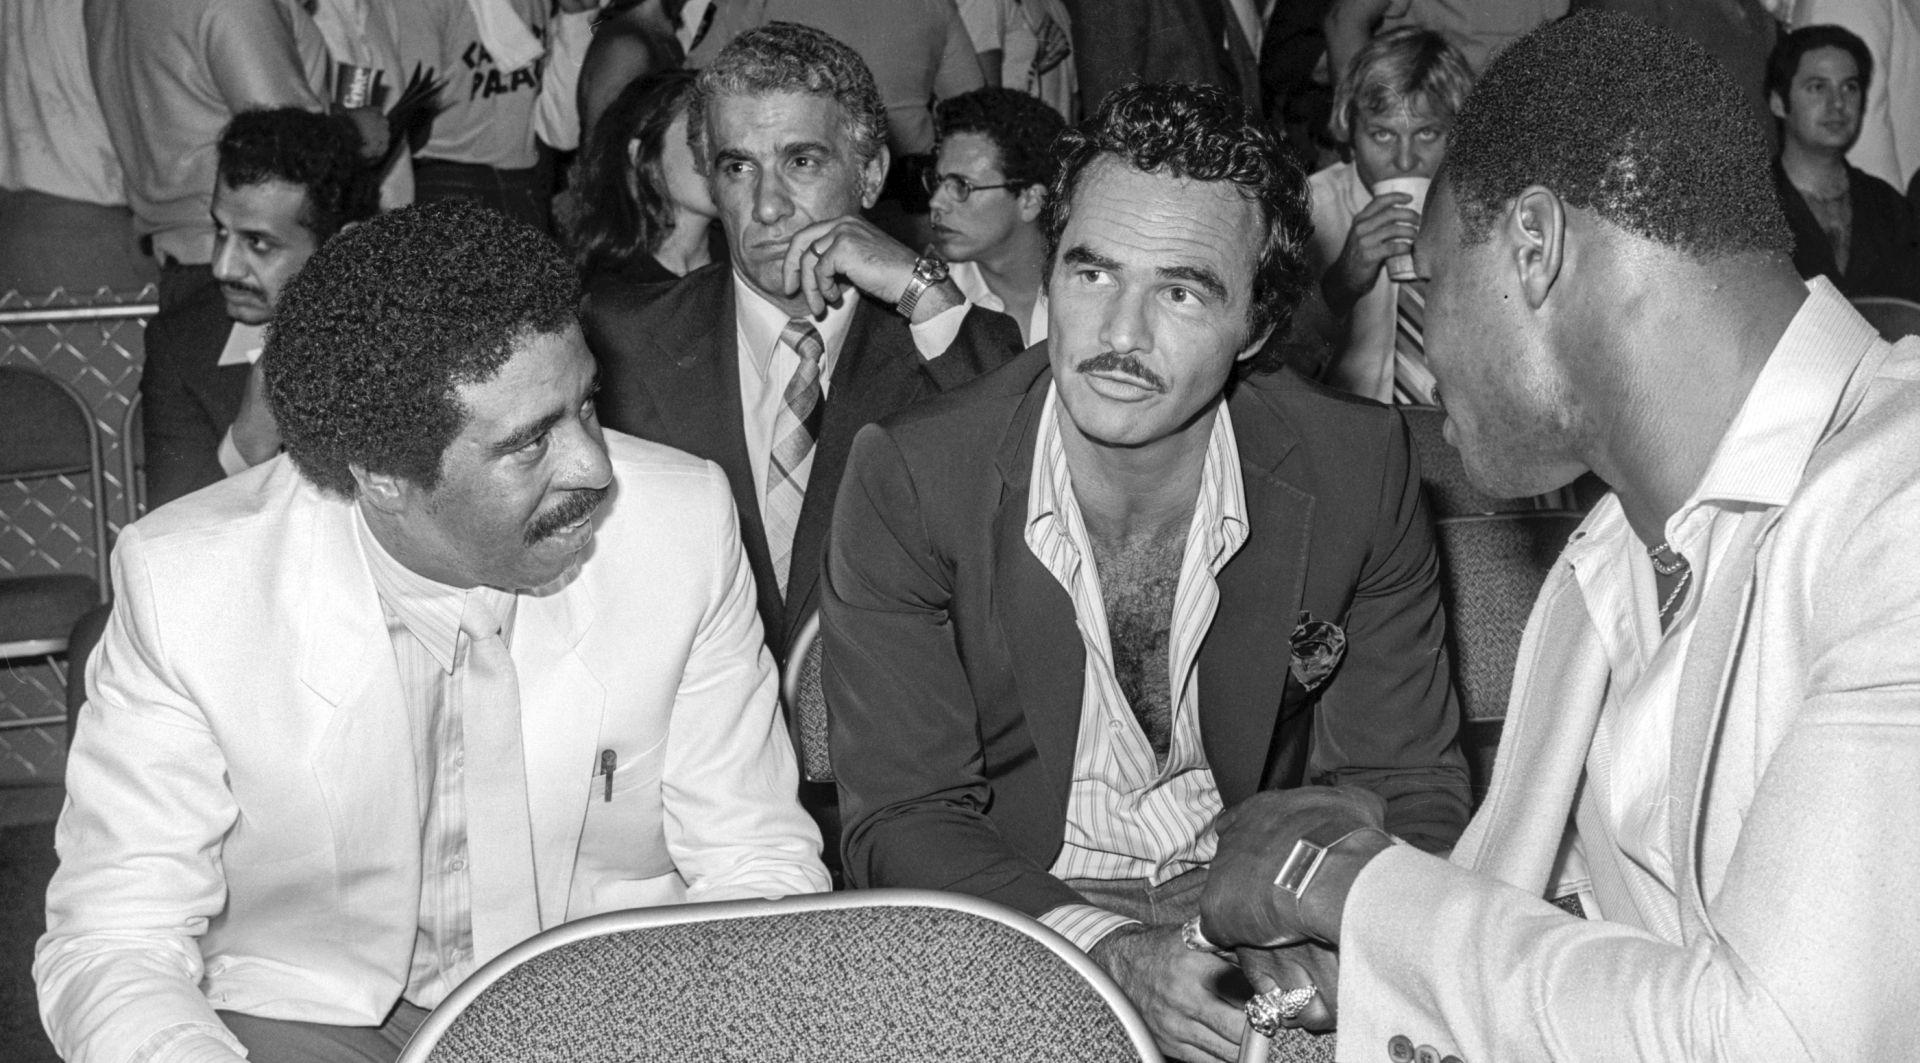 Preminuo Burt Reynolds, zvijezda i seks simbol Hollywooda 70-ih